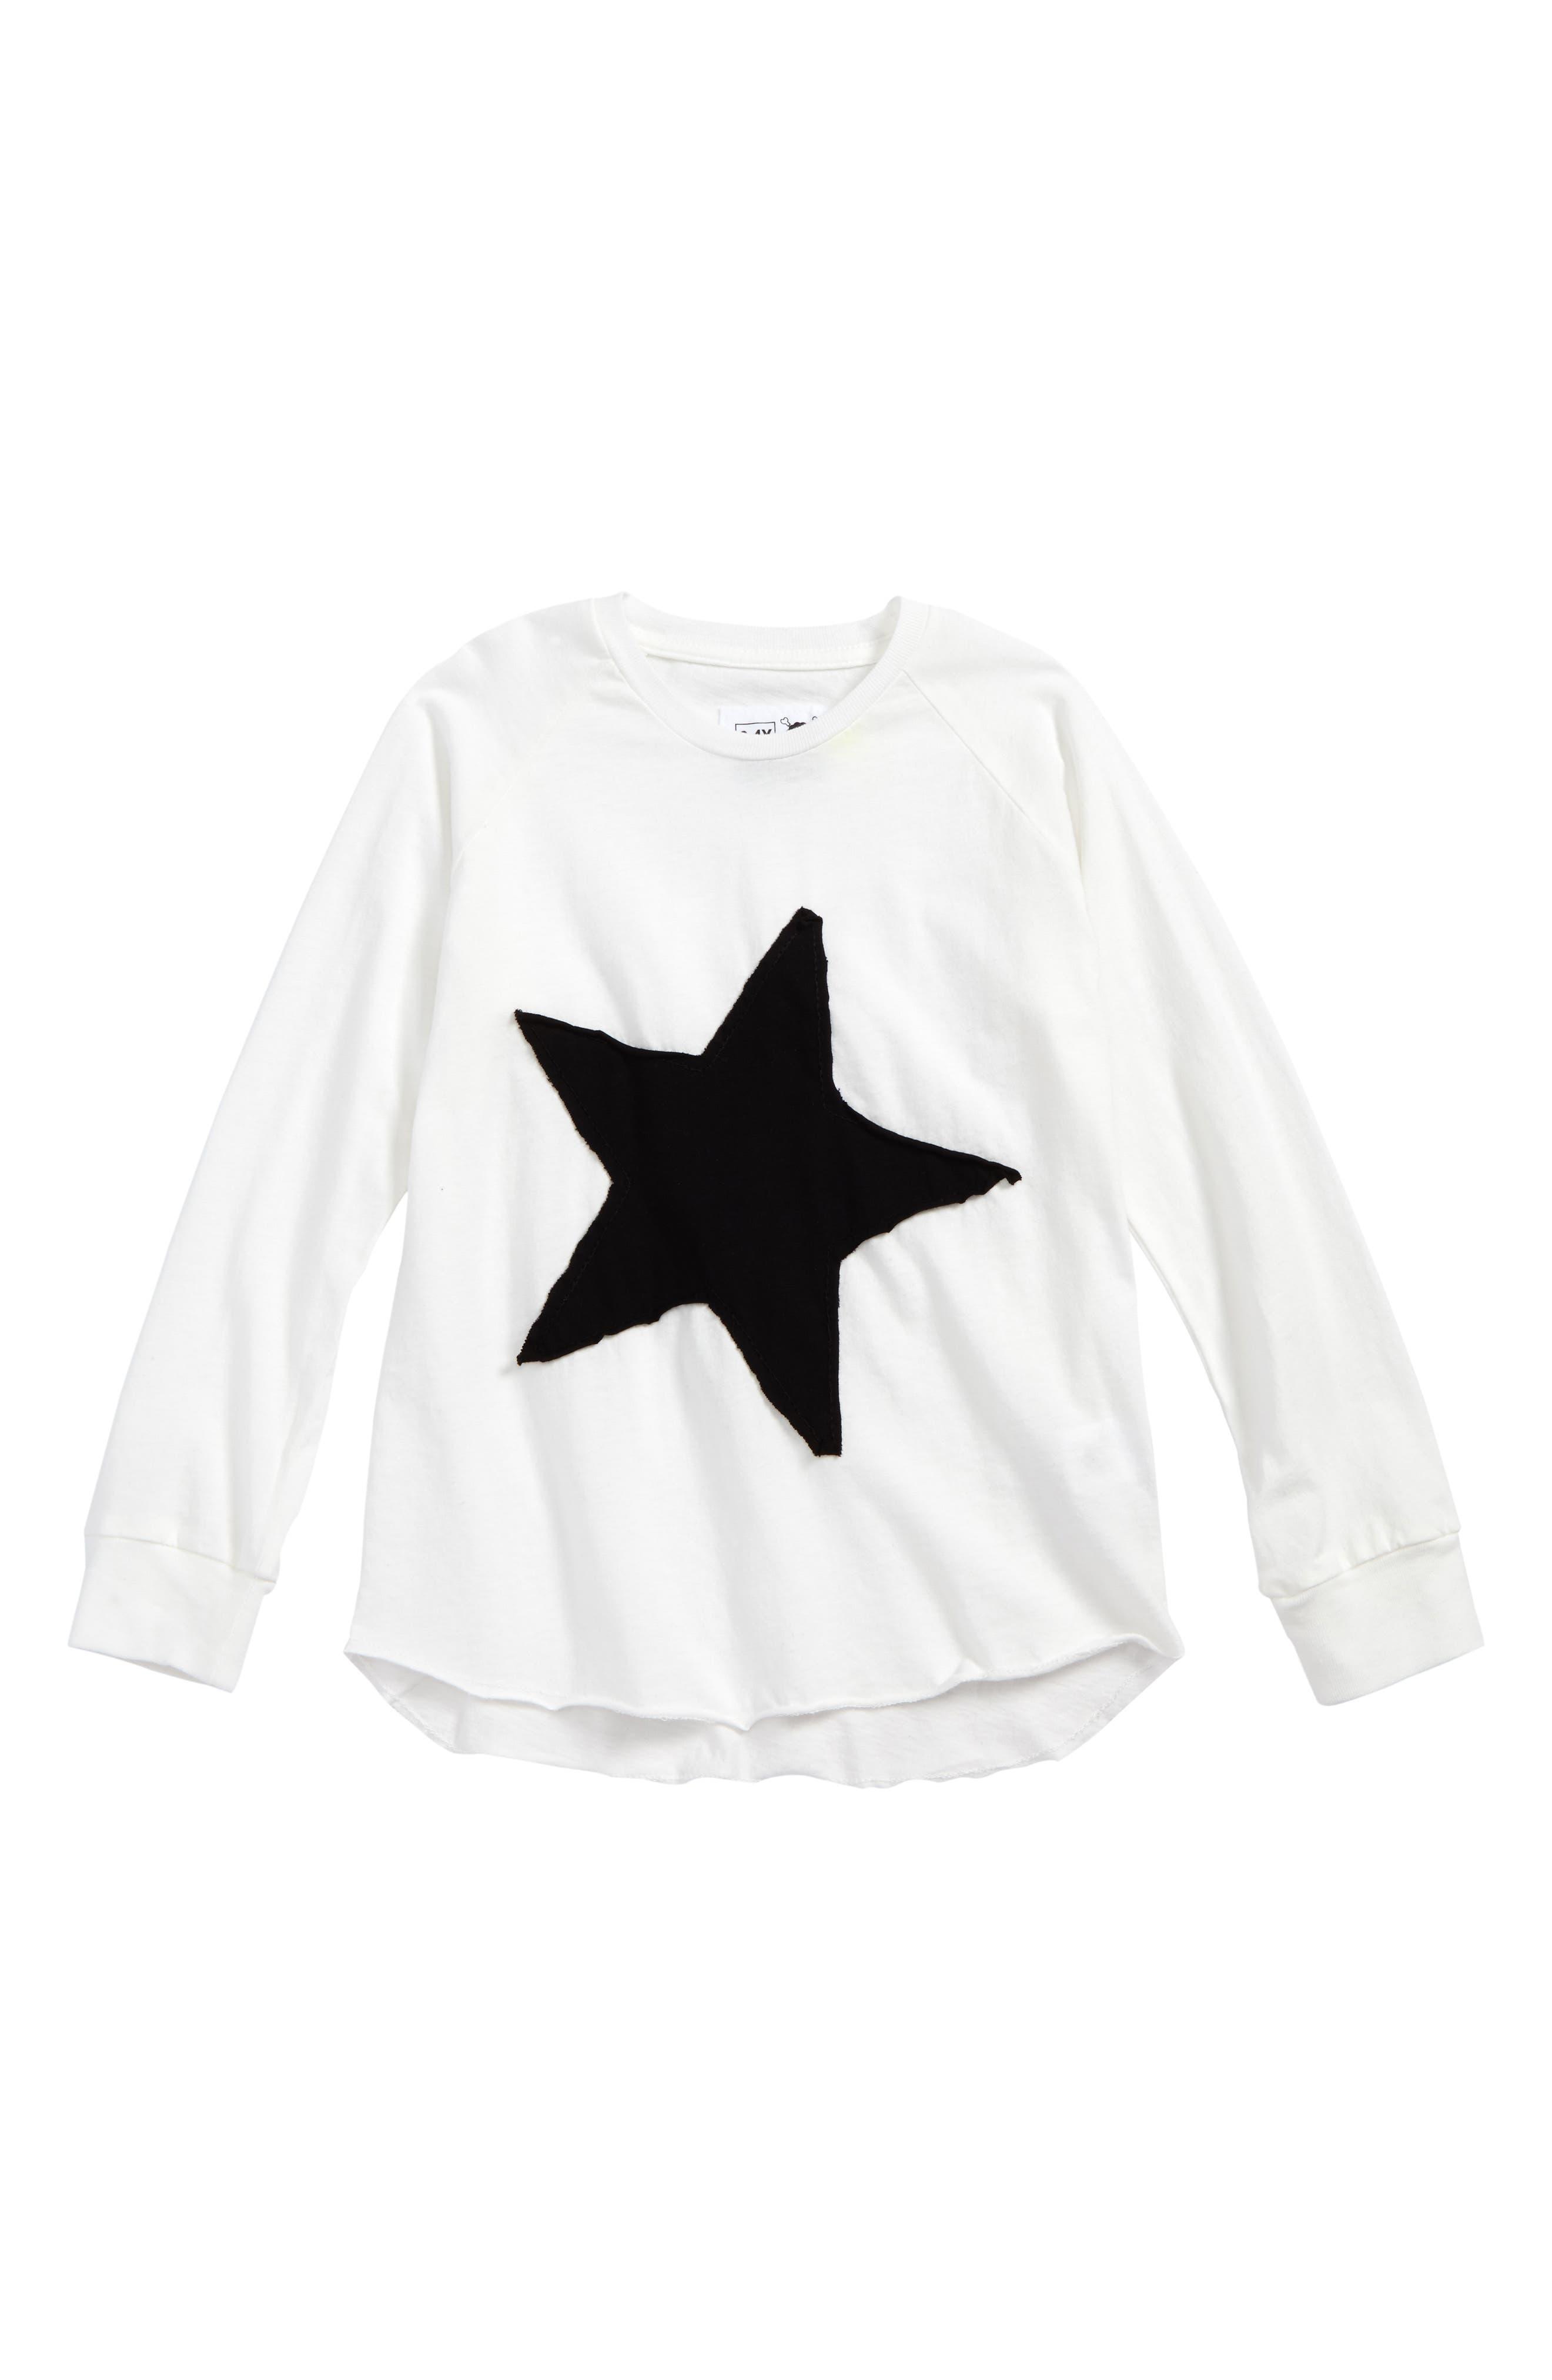 Main Image - NUNUNU Star Patch Tee (Toddler Girls & Little Girls)